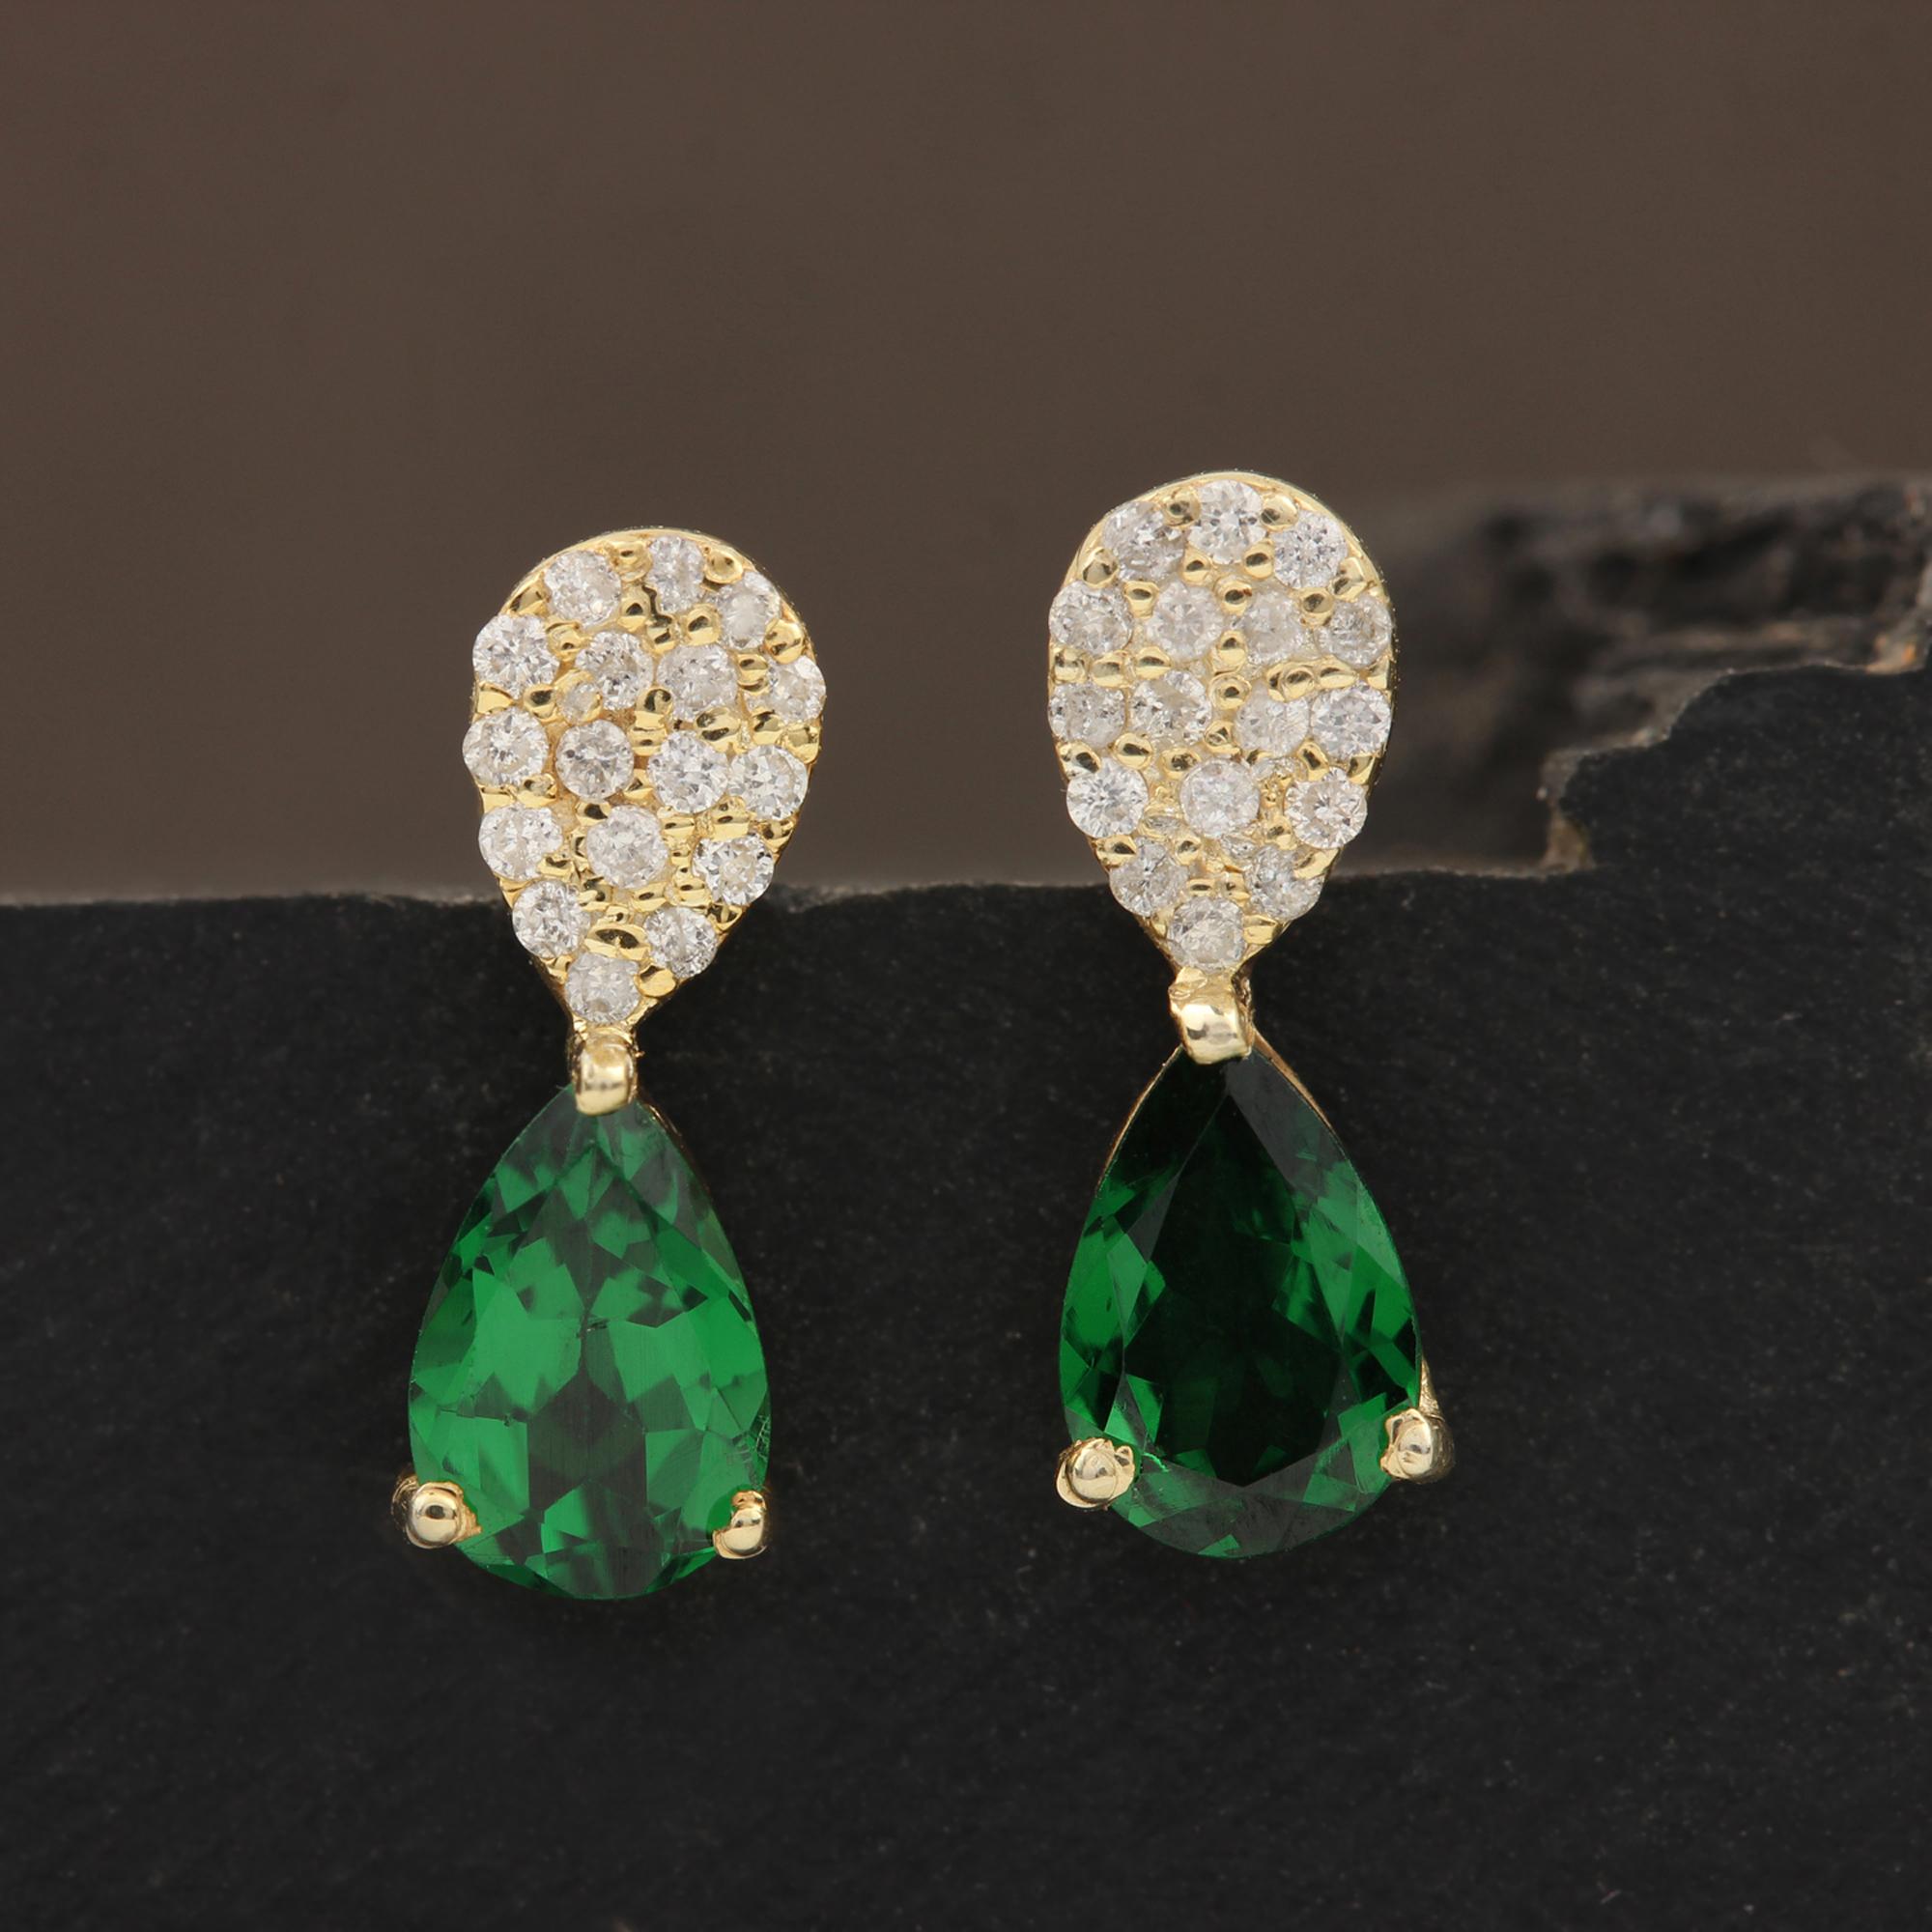 14k Solid Gold Stud Earrings Adorned With Diamond & Tsavorite